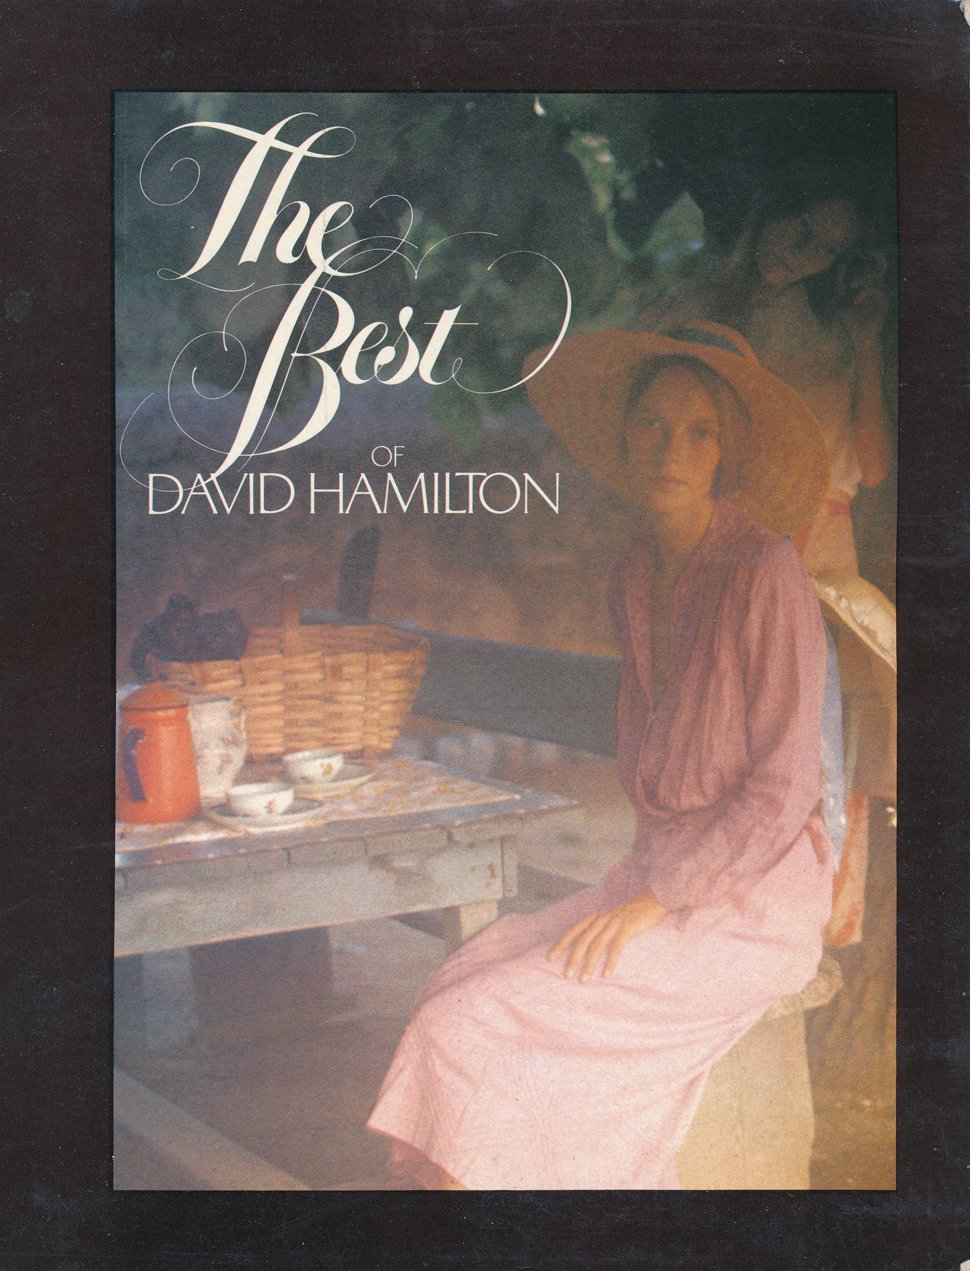 david hamilton nudes Amazon.com: The Best of David Hamilton (9780688004033): Denise Couttes, David  Hamilton: Books